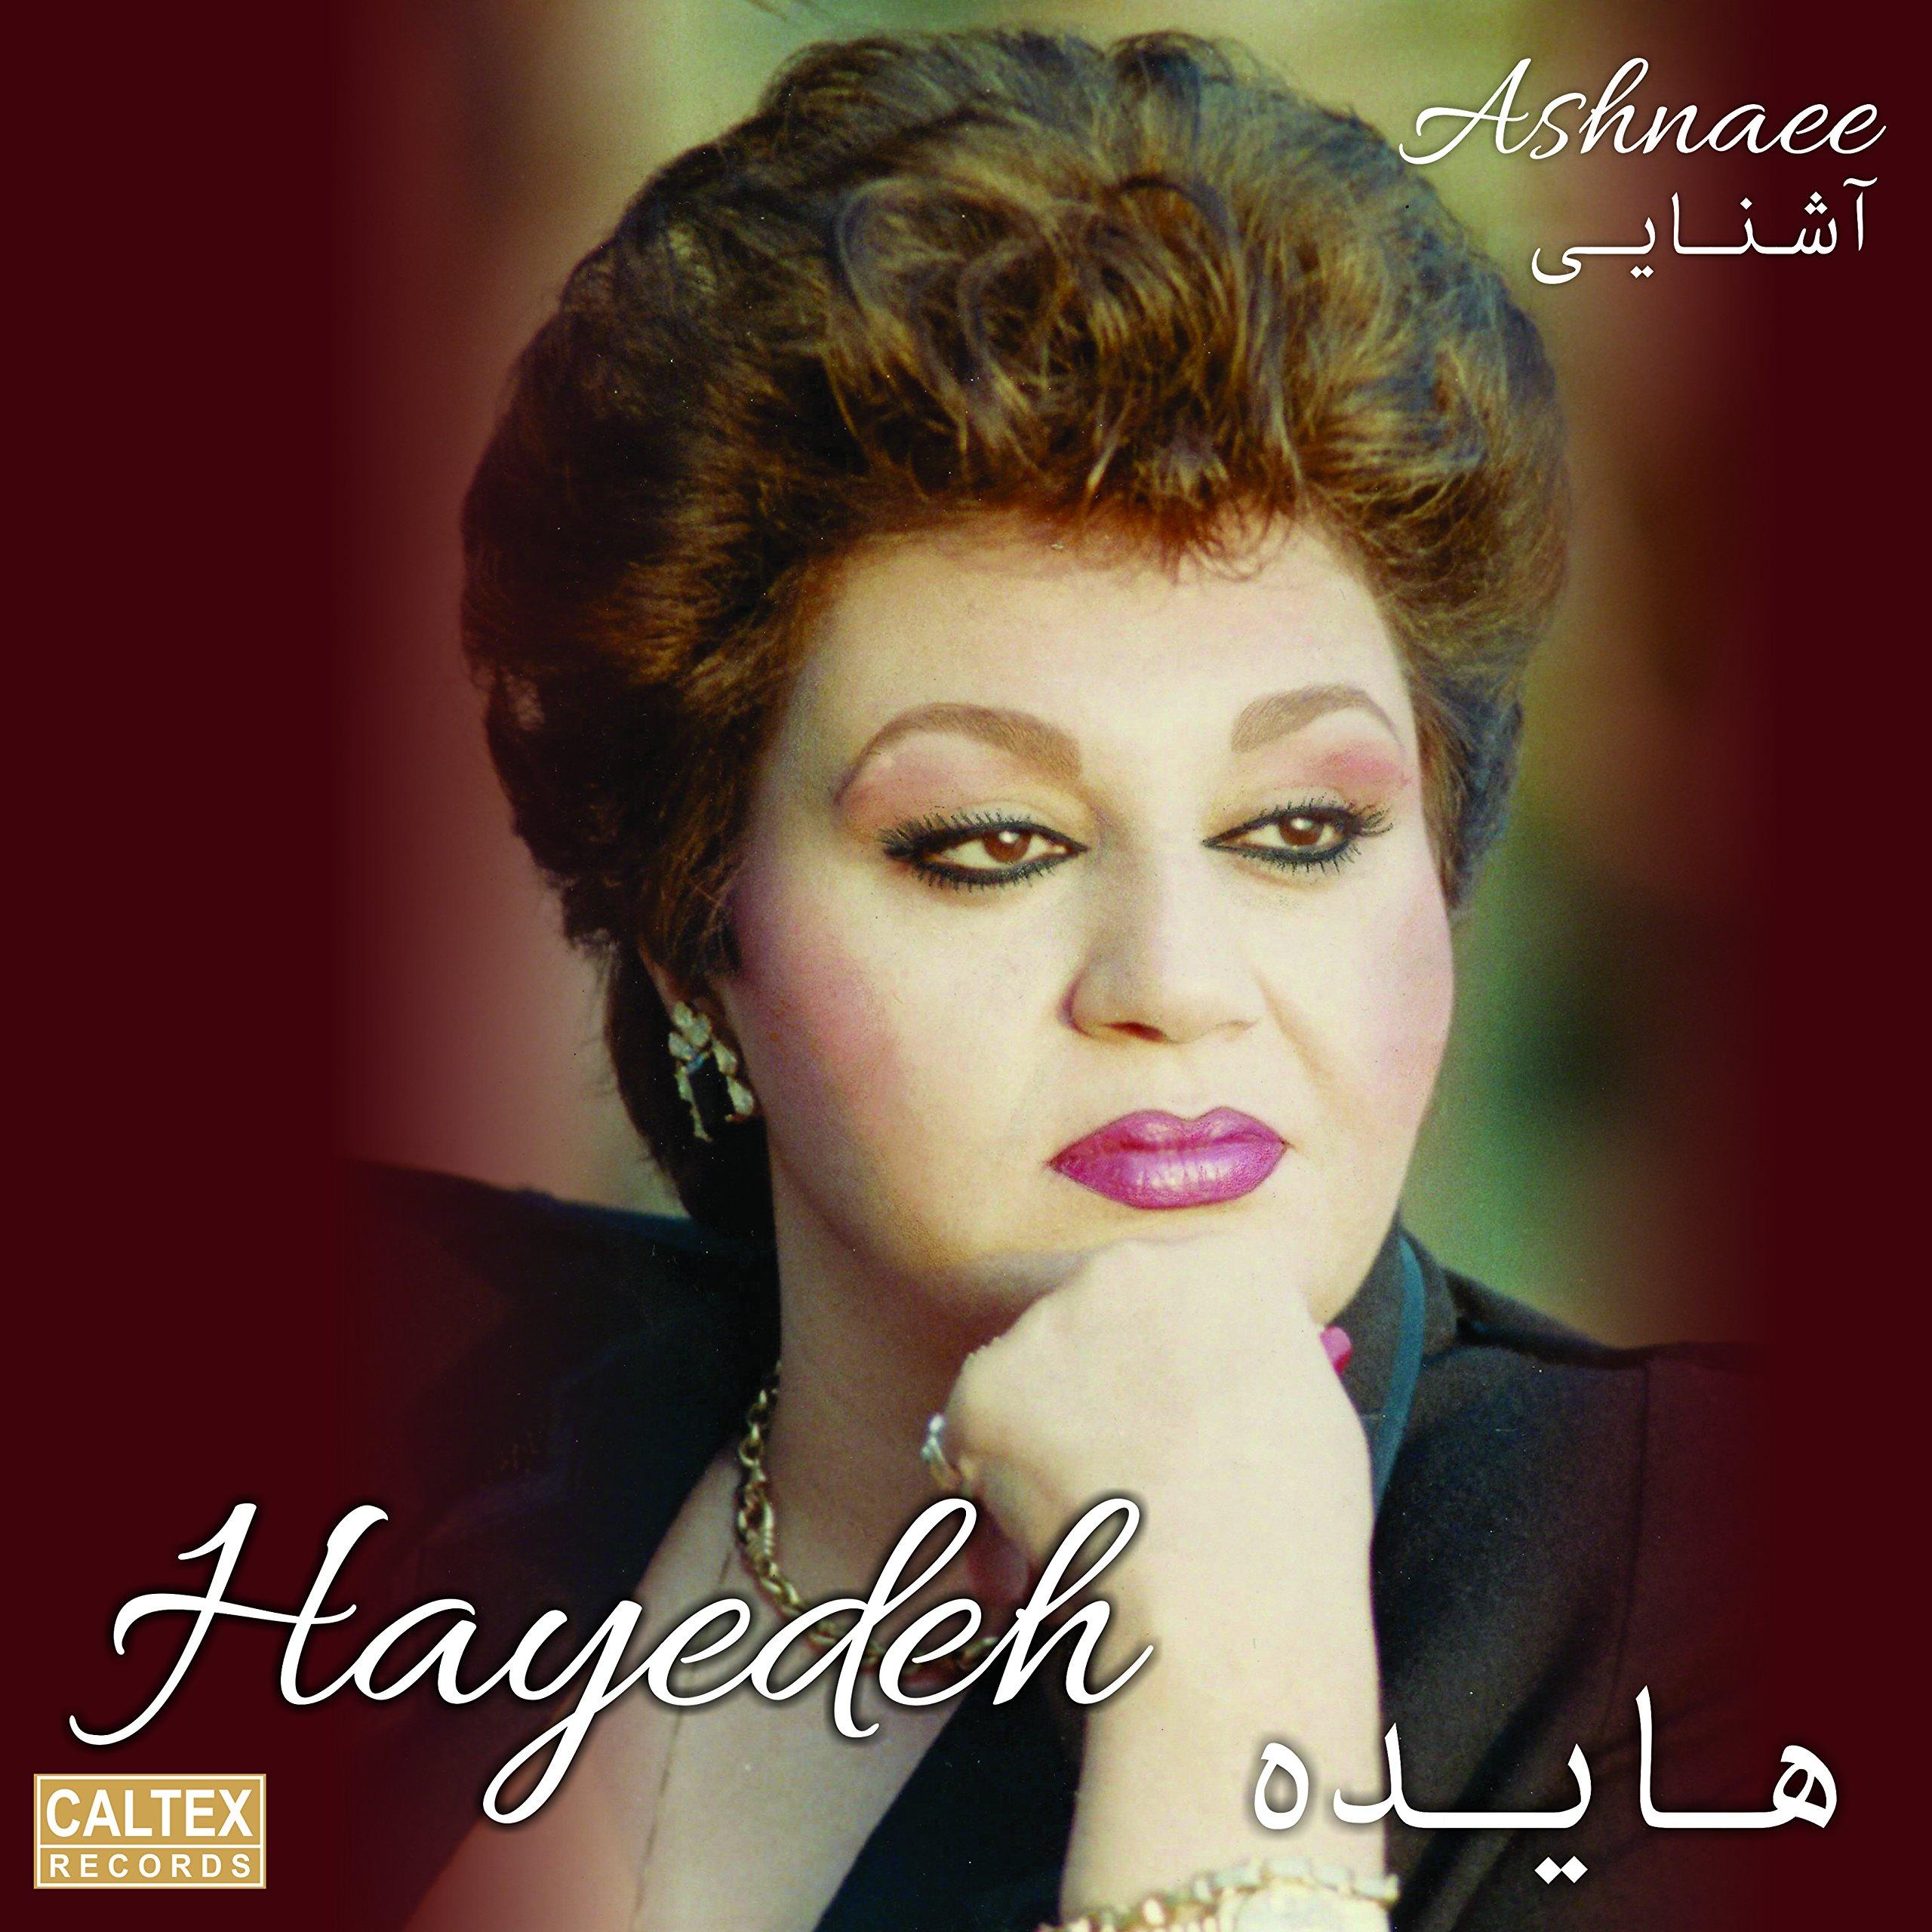 Ashnaee (Vinyl) - Persian Music by Caltex Records